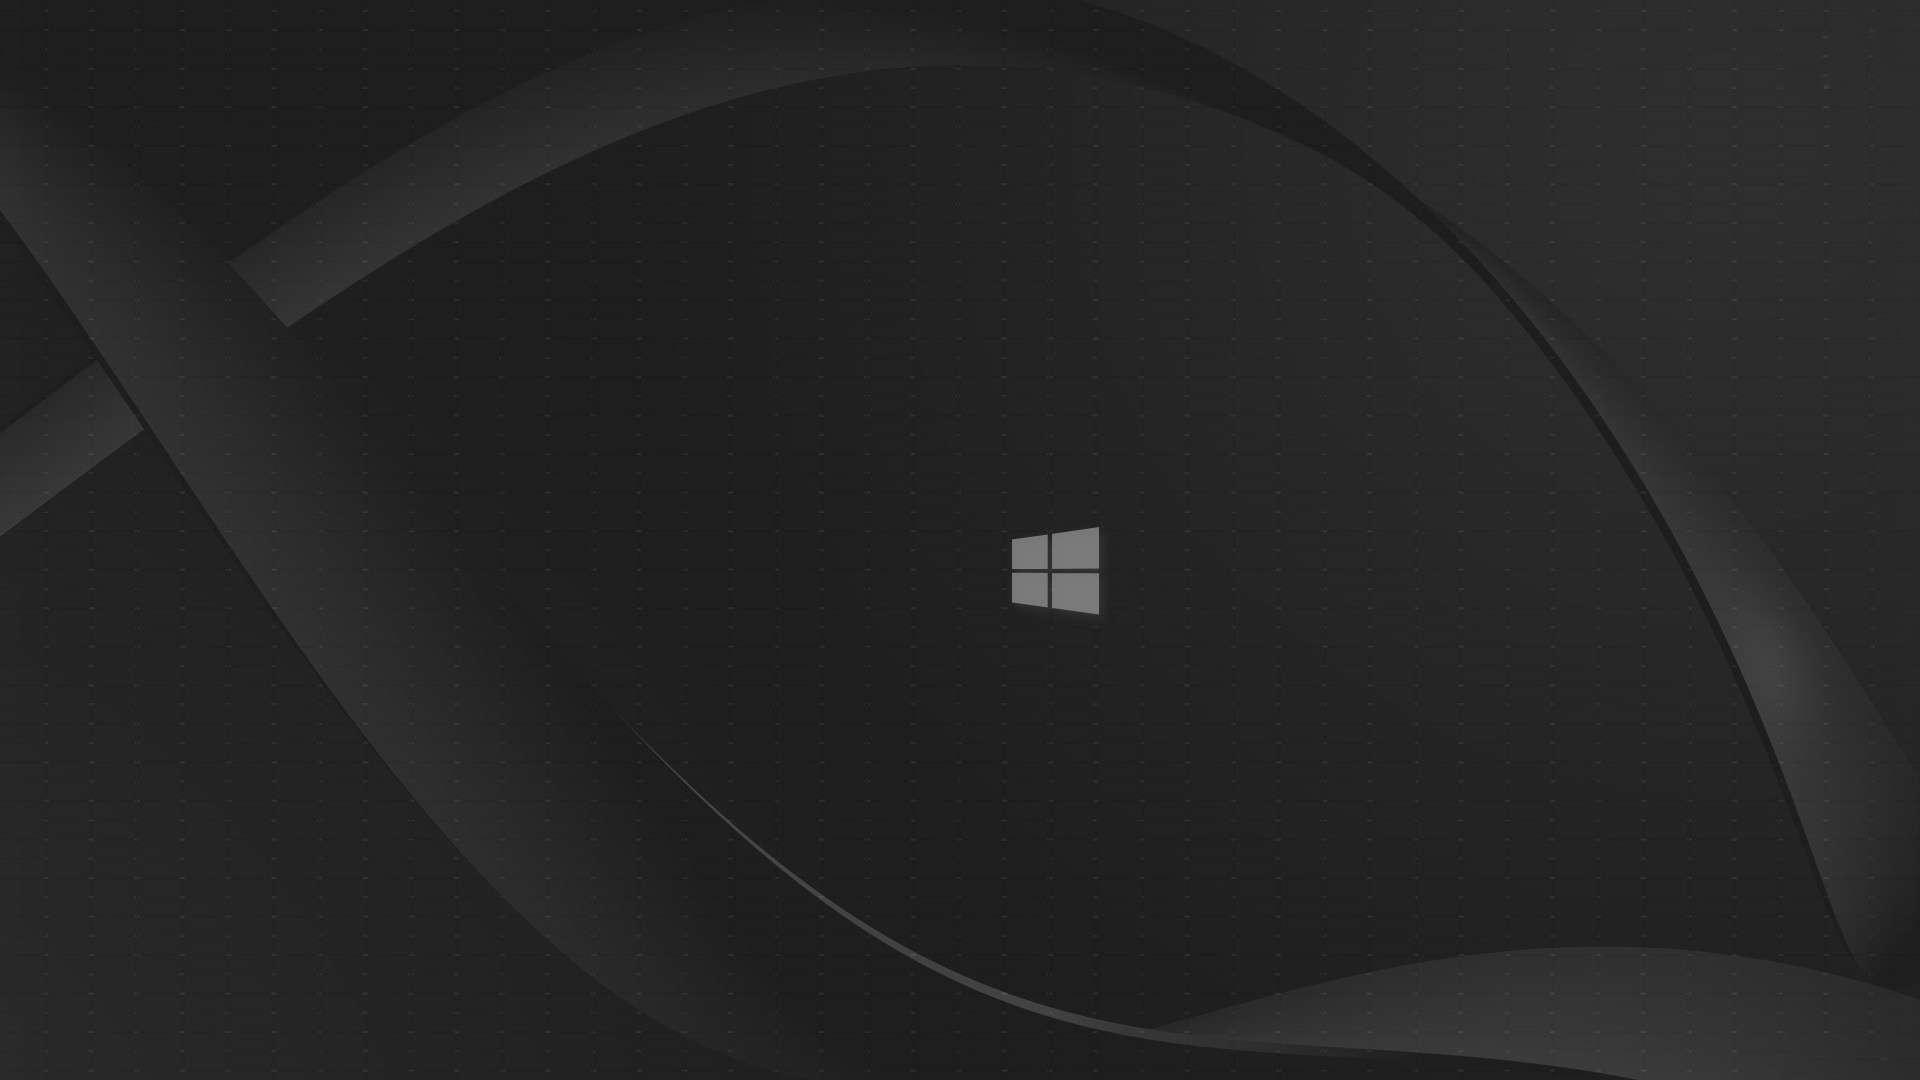 Hd wallpaper upload - Wallpaper Windows 10 Black Wallpaper Hd 1080p Upload At January 7